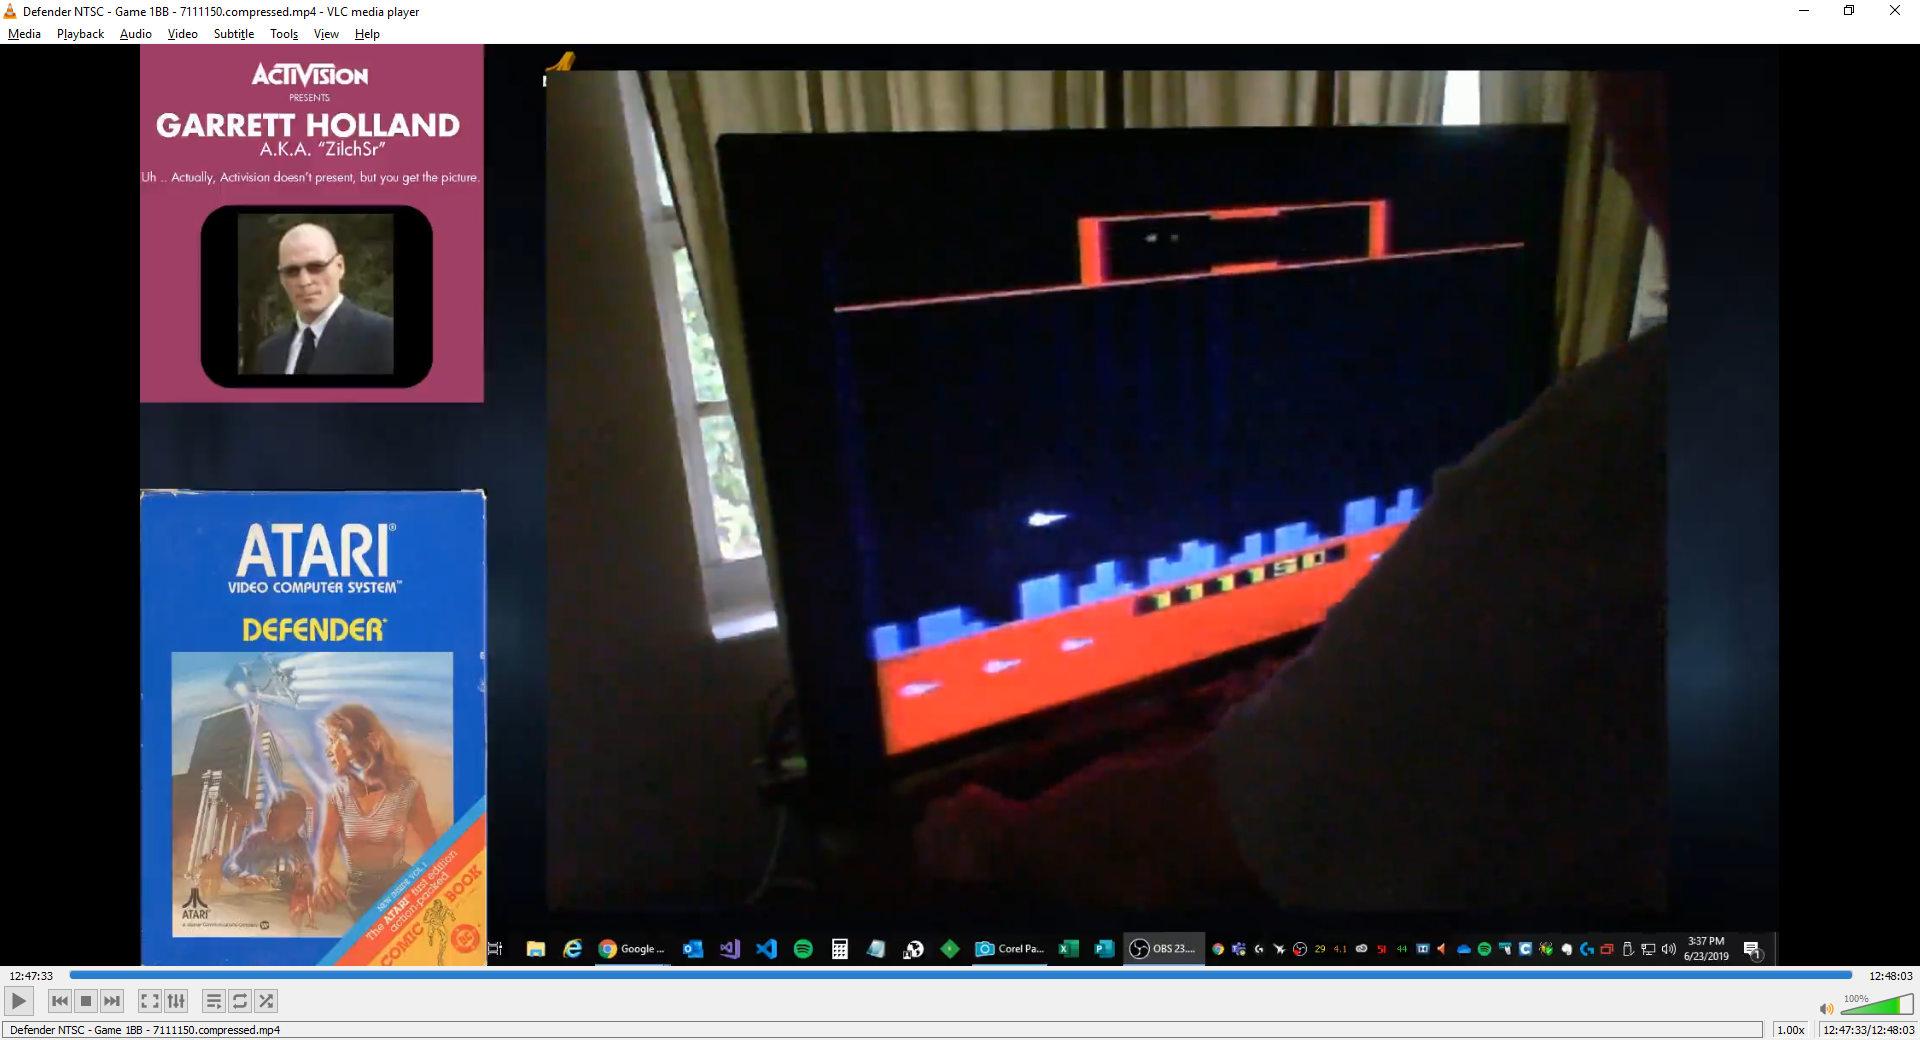 ZilchSr: Defender (Atari 2600 Novice/B) 7,111,150 points on 2019-08-08 20:54:22